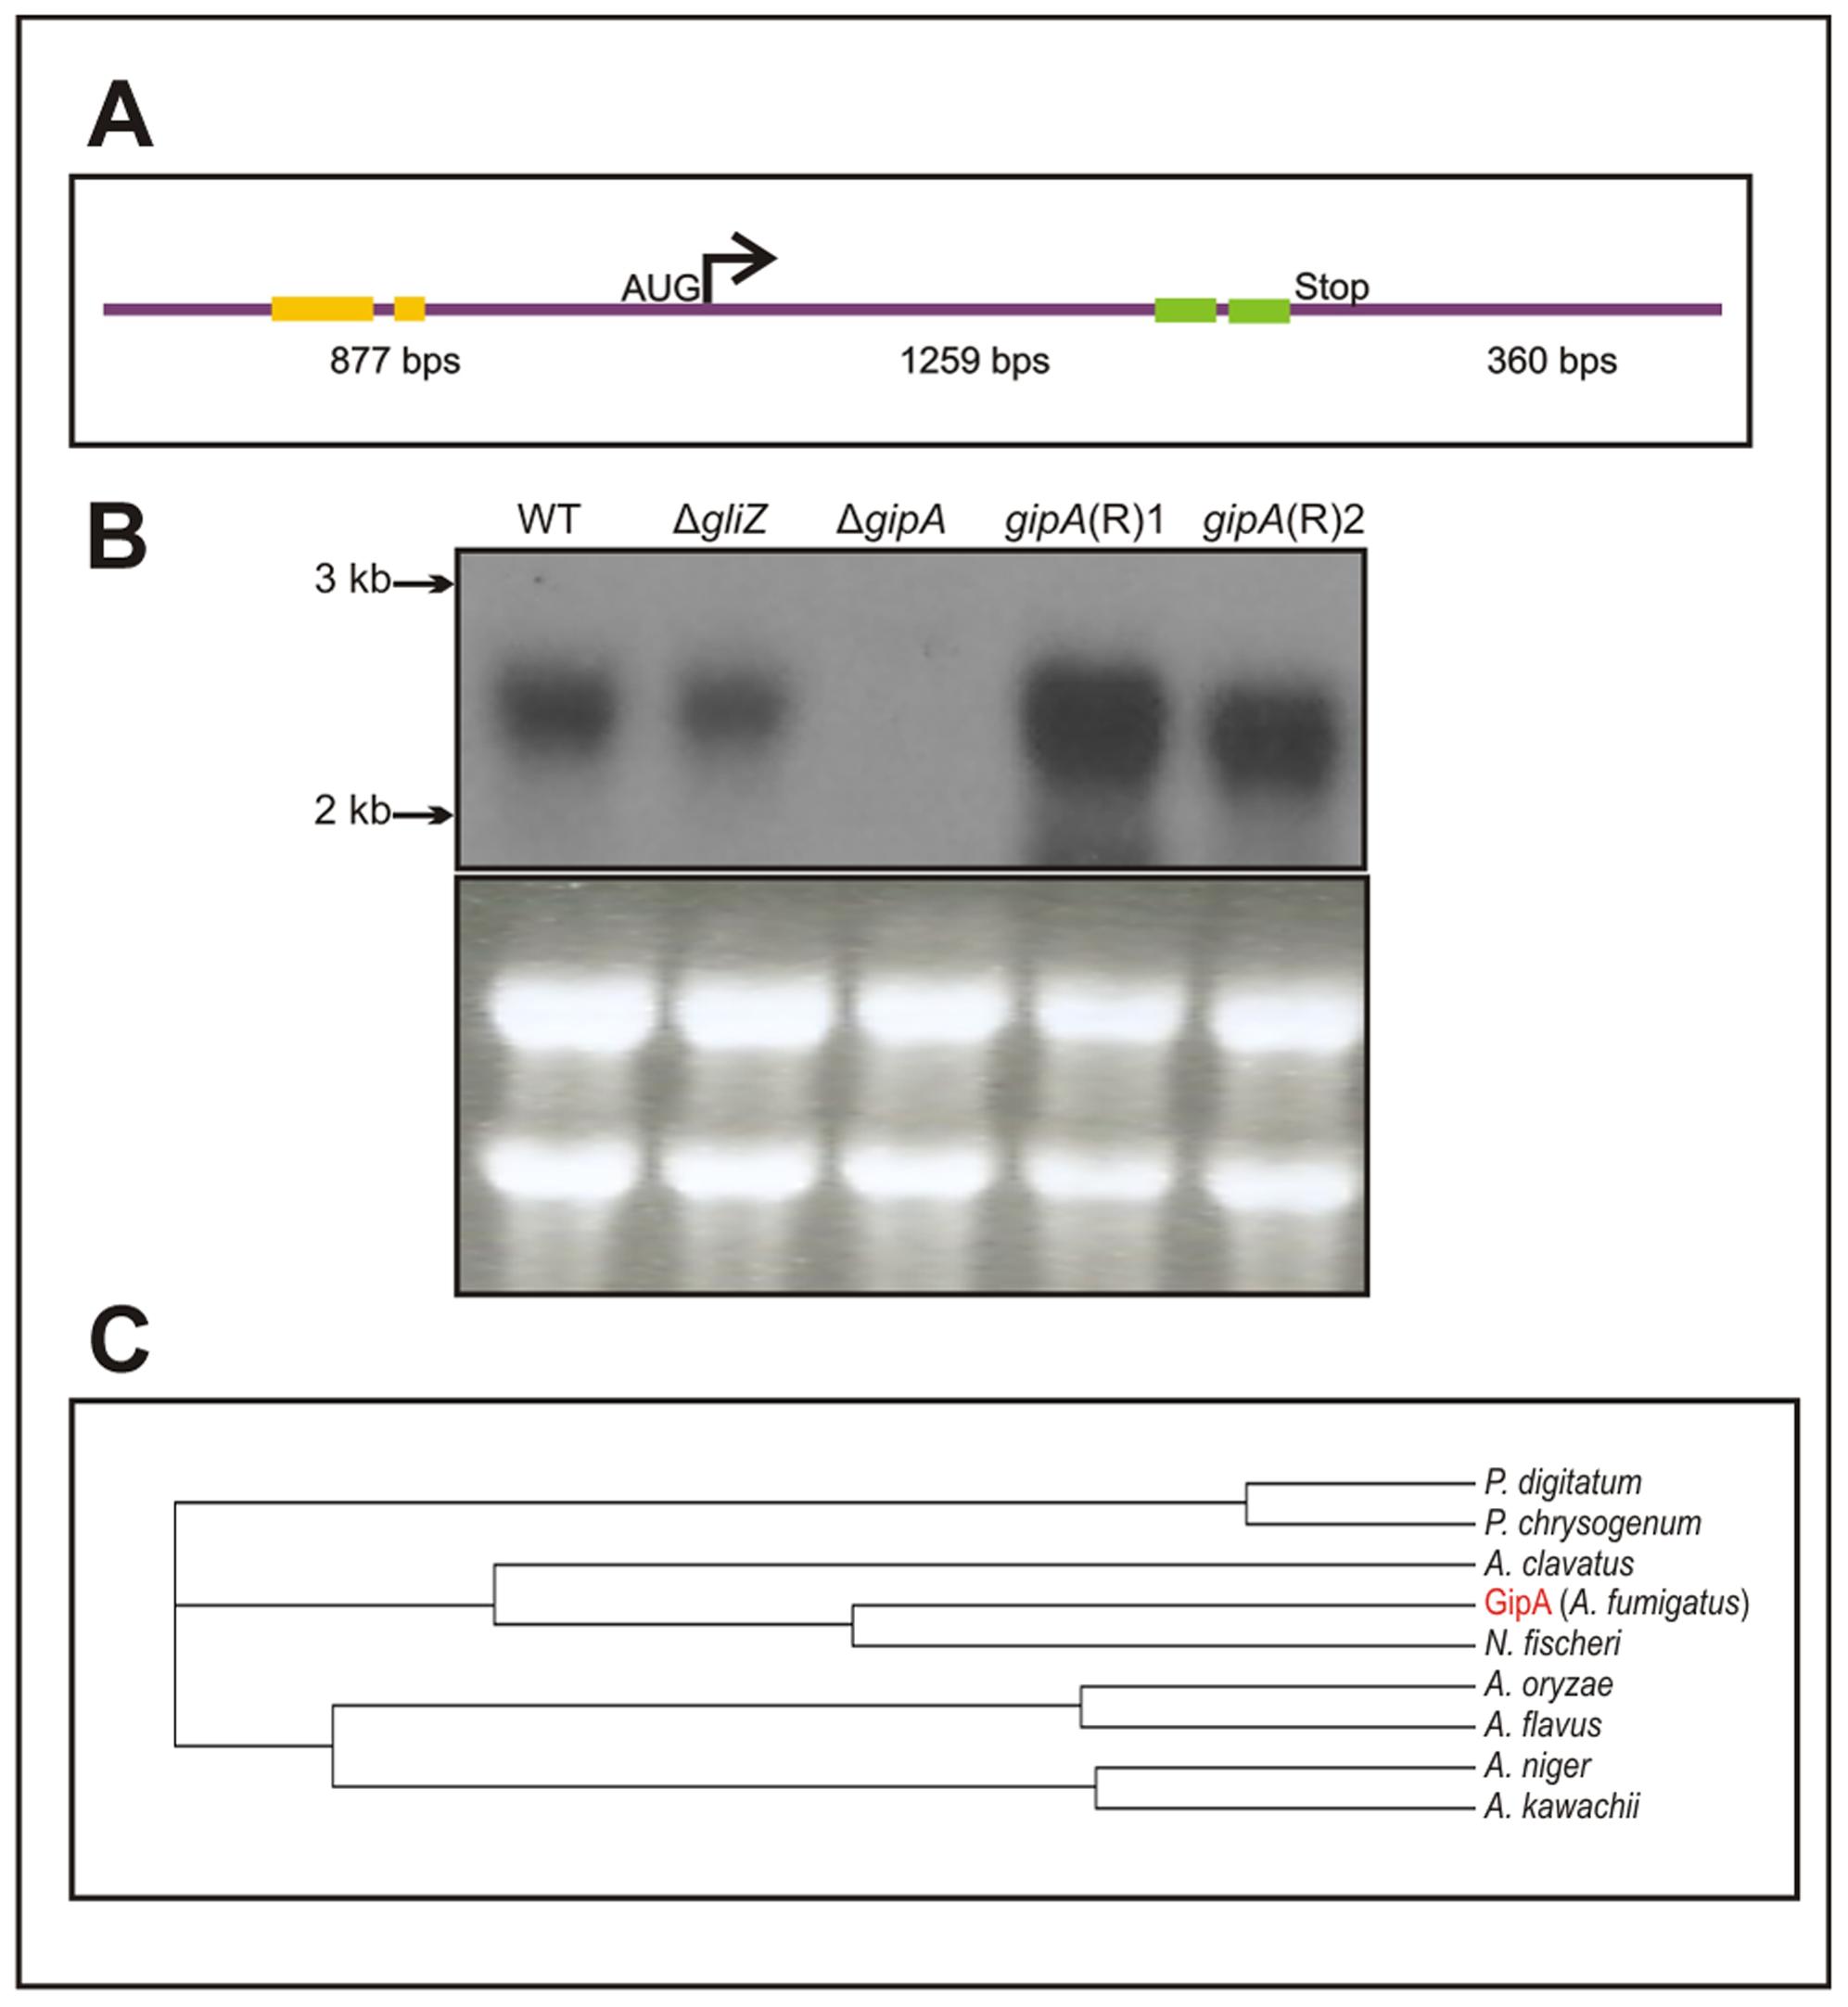 Characterization of <i>gipA</i> cDNA.